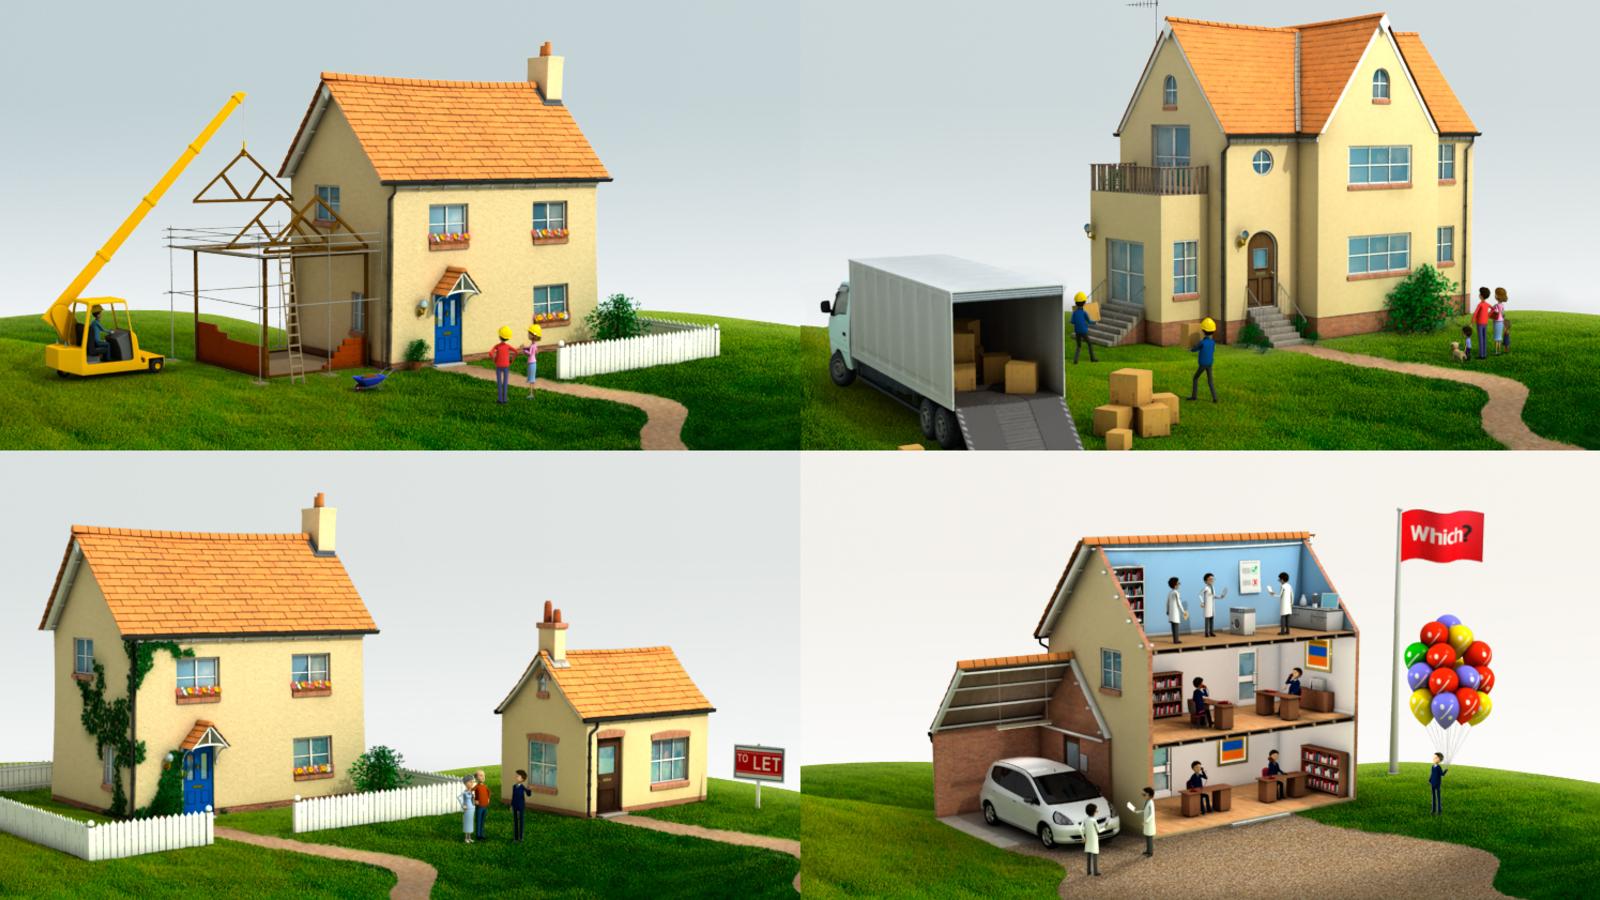 Final 3d render of house